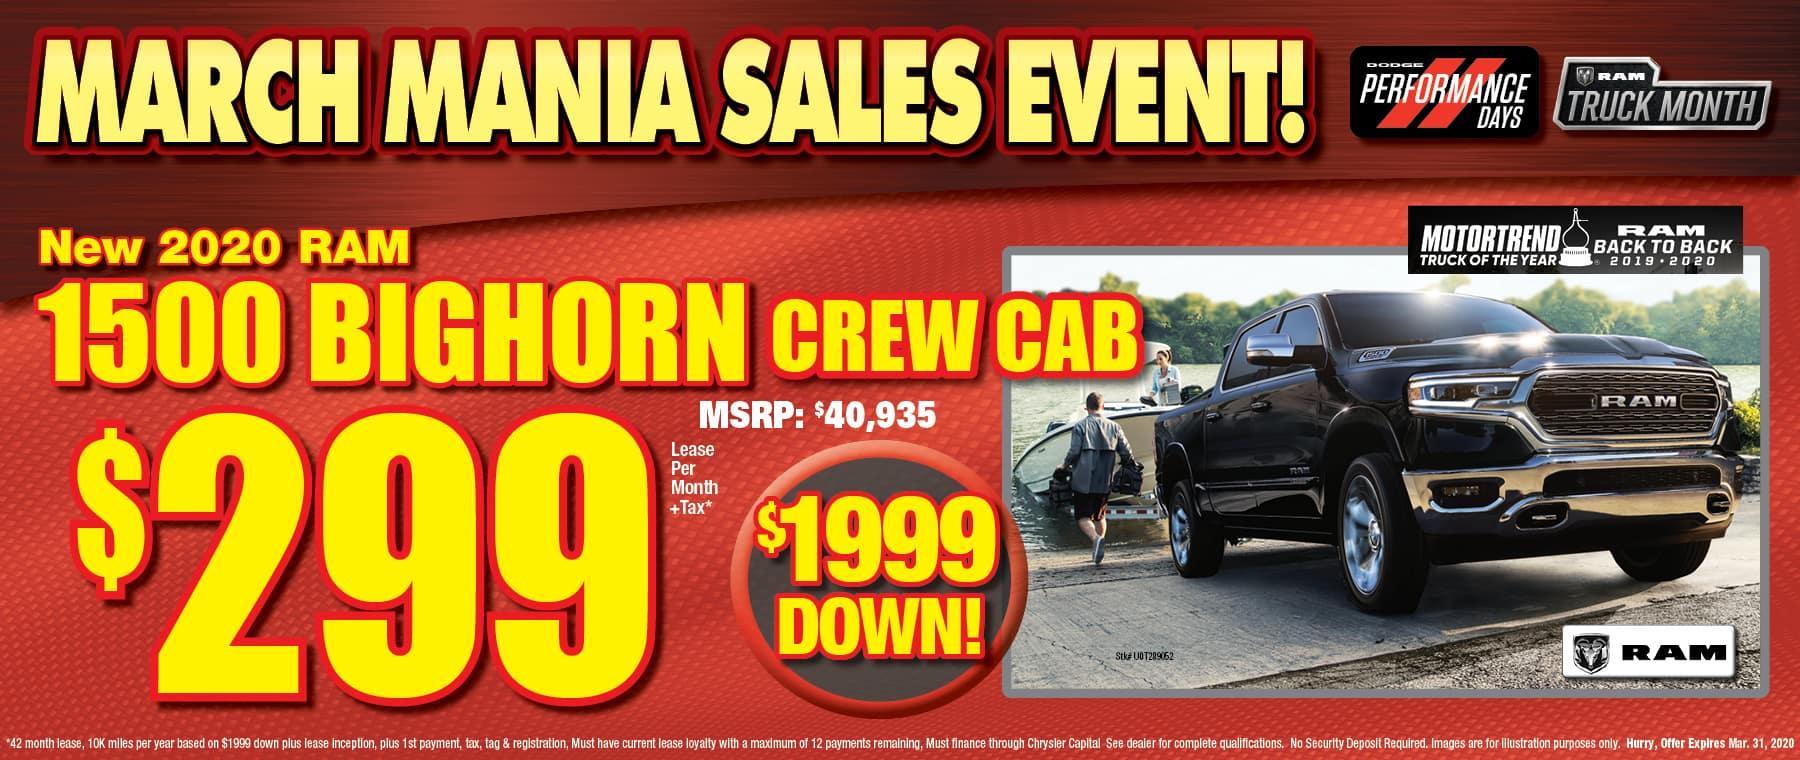 Nwq 2020 Ram Big Horn Crew Cabs!